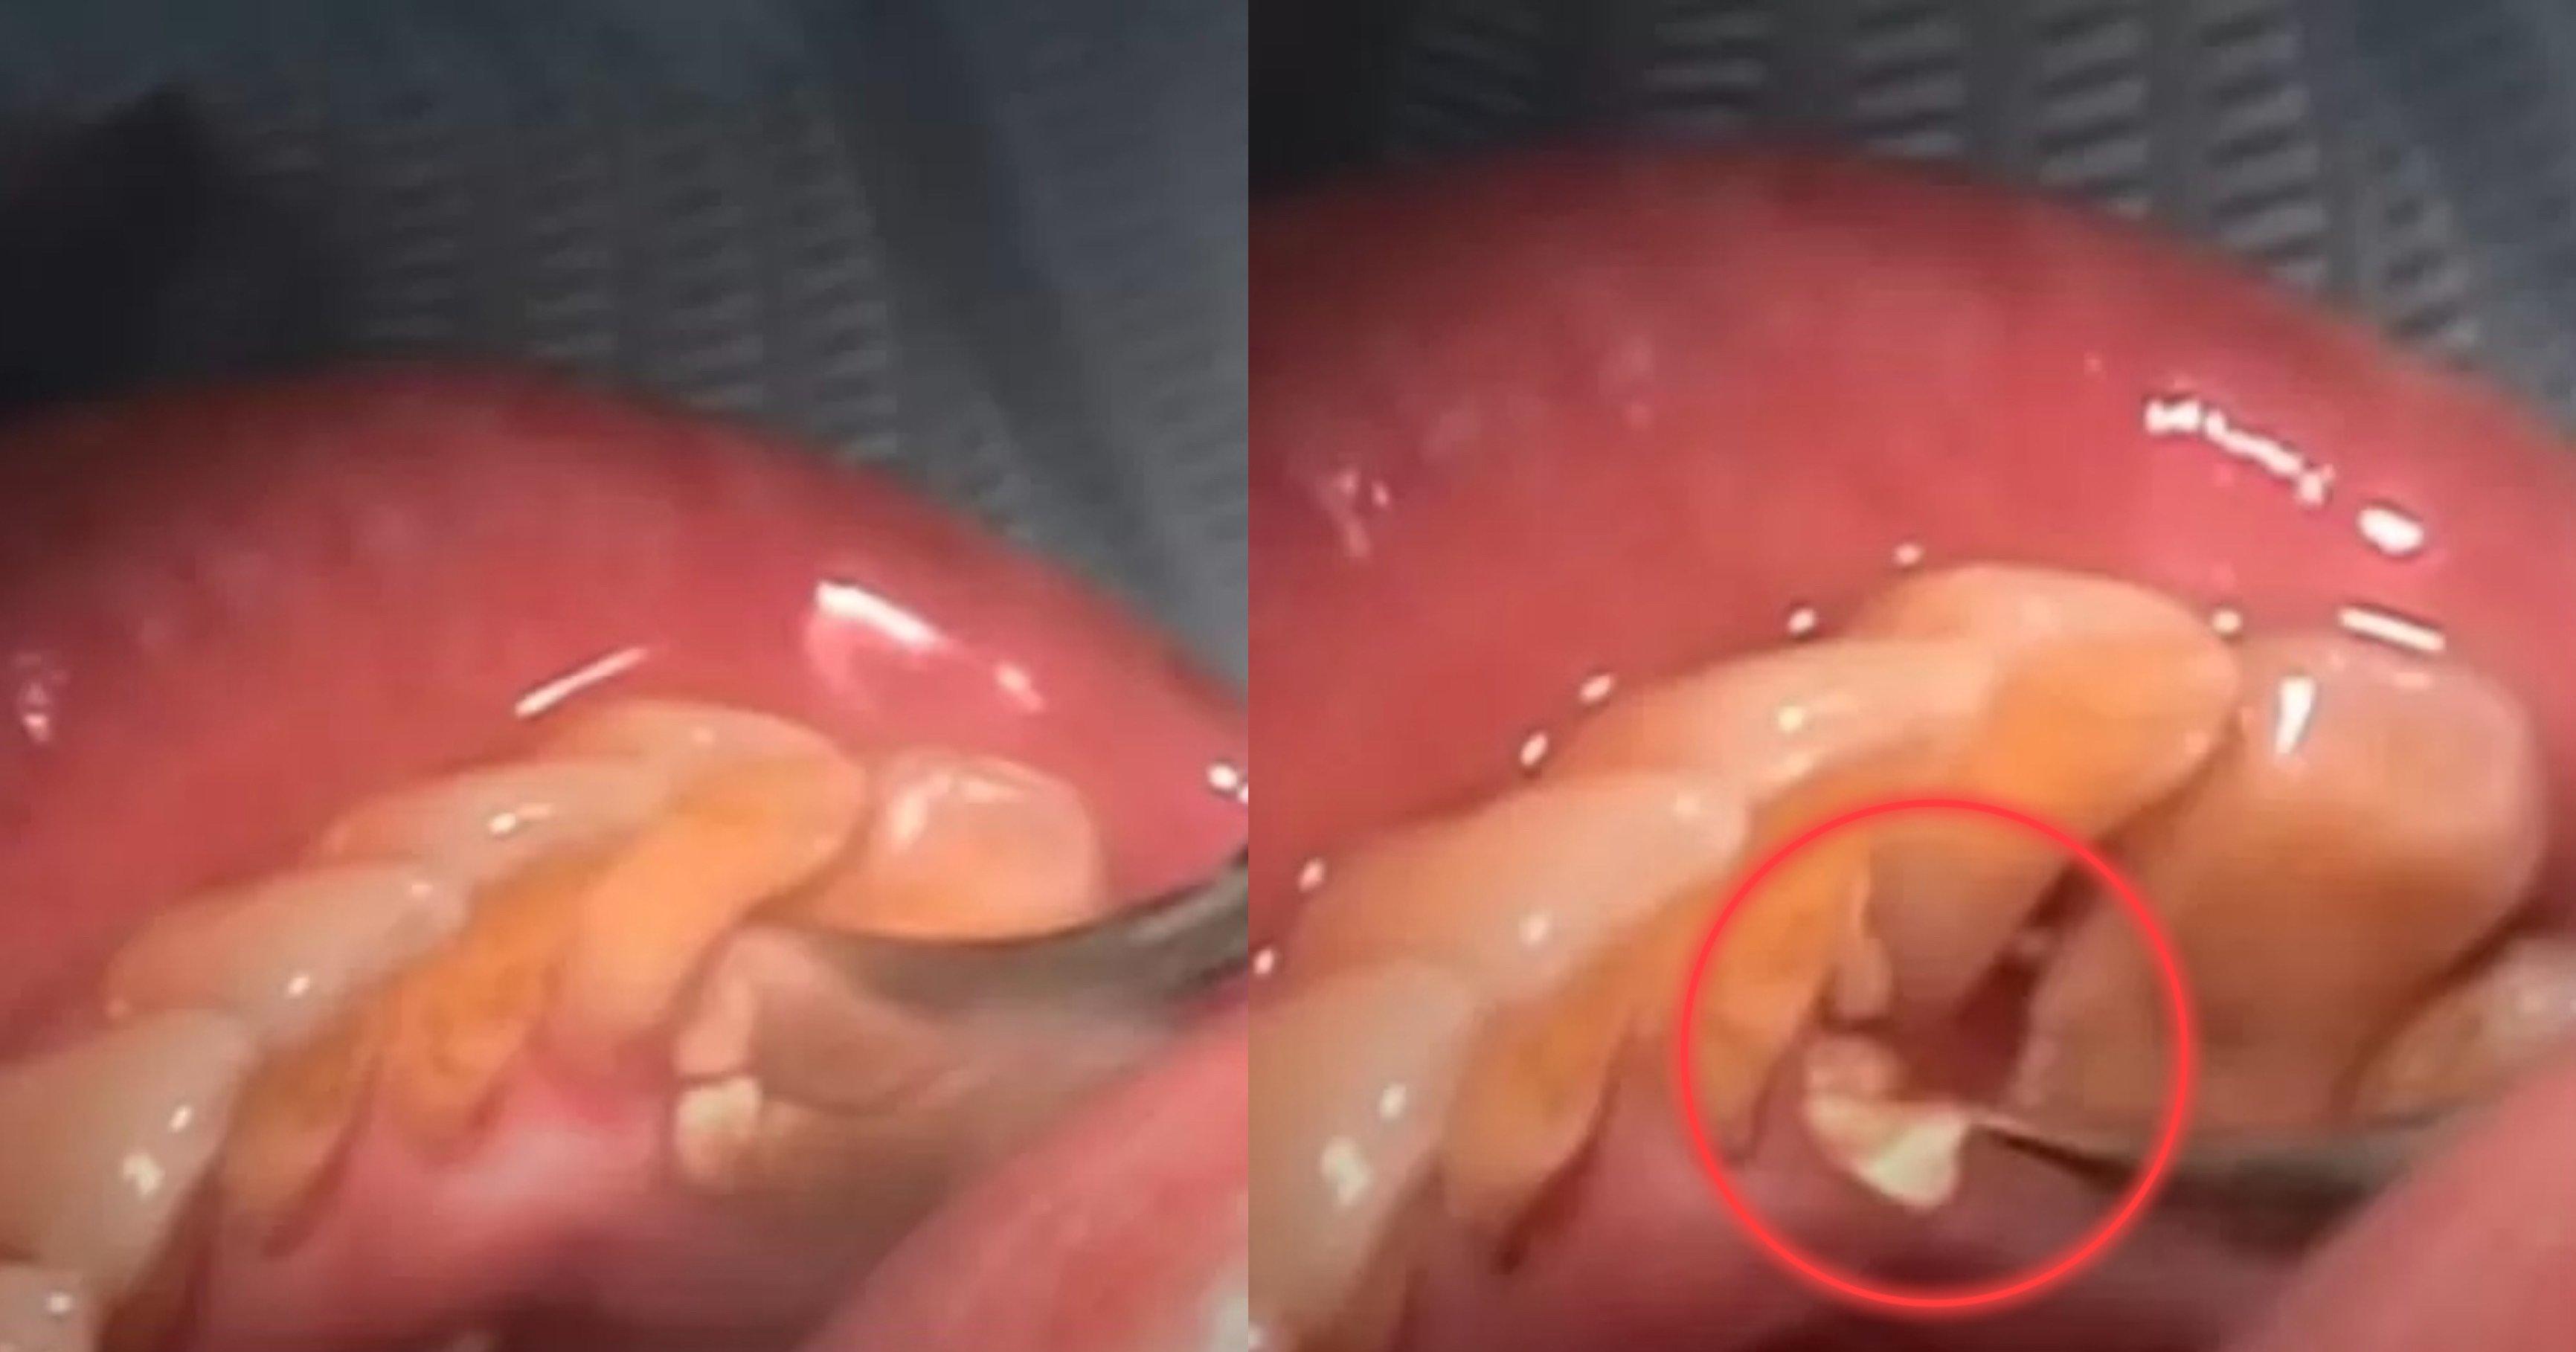 "40b50ef2 fc52 44d9 9cb6 5a045821320a.jpeg?resize=412,232 - ""와 보기만 해도 시원하다""..치과 의사가 직접 공개한 처음으로 '스케일링' 받는 환자의 '치석' 제거 영상"